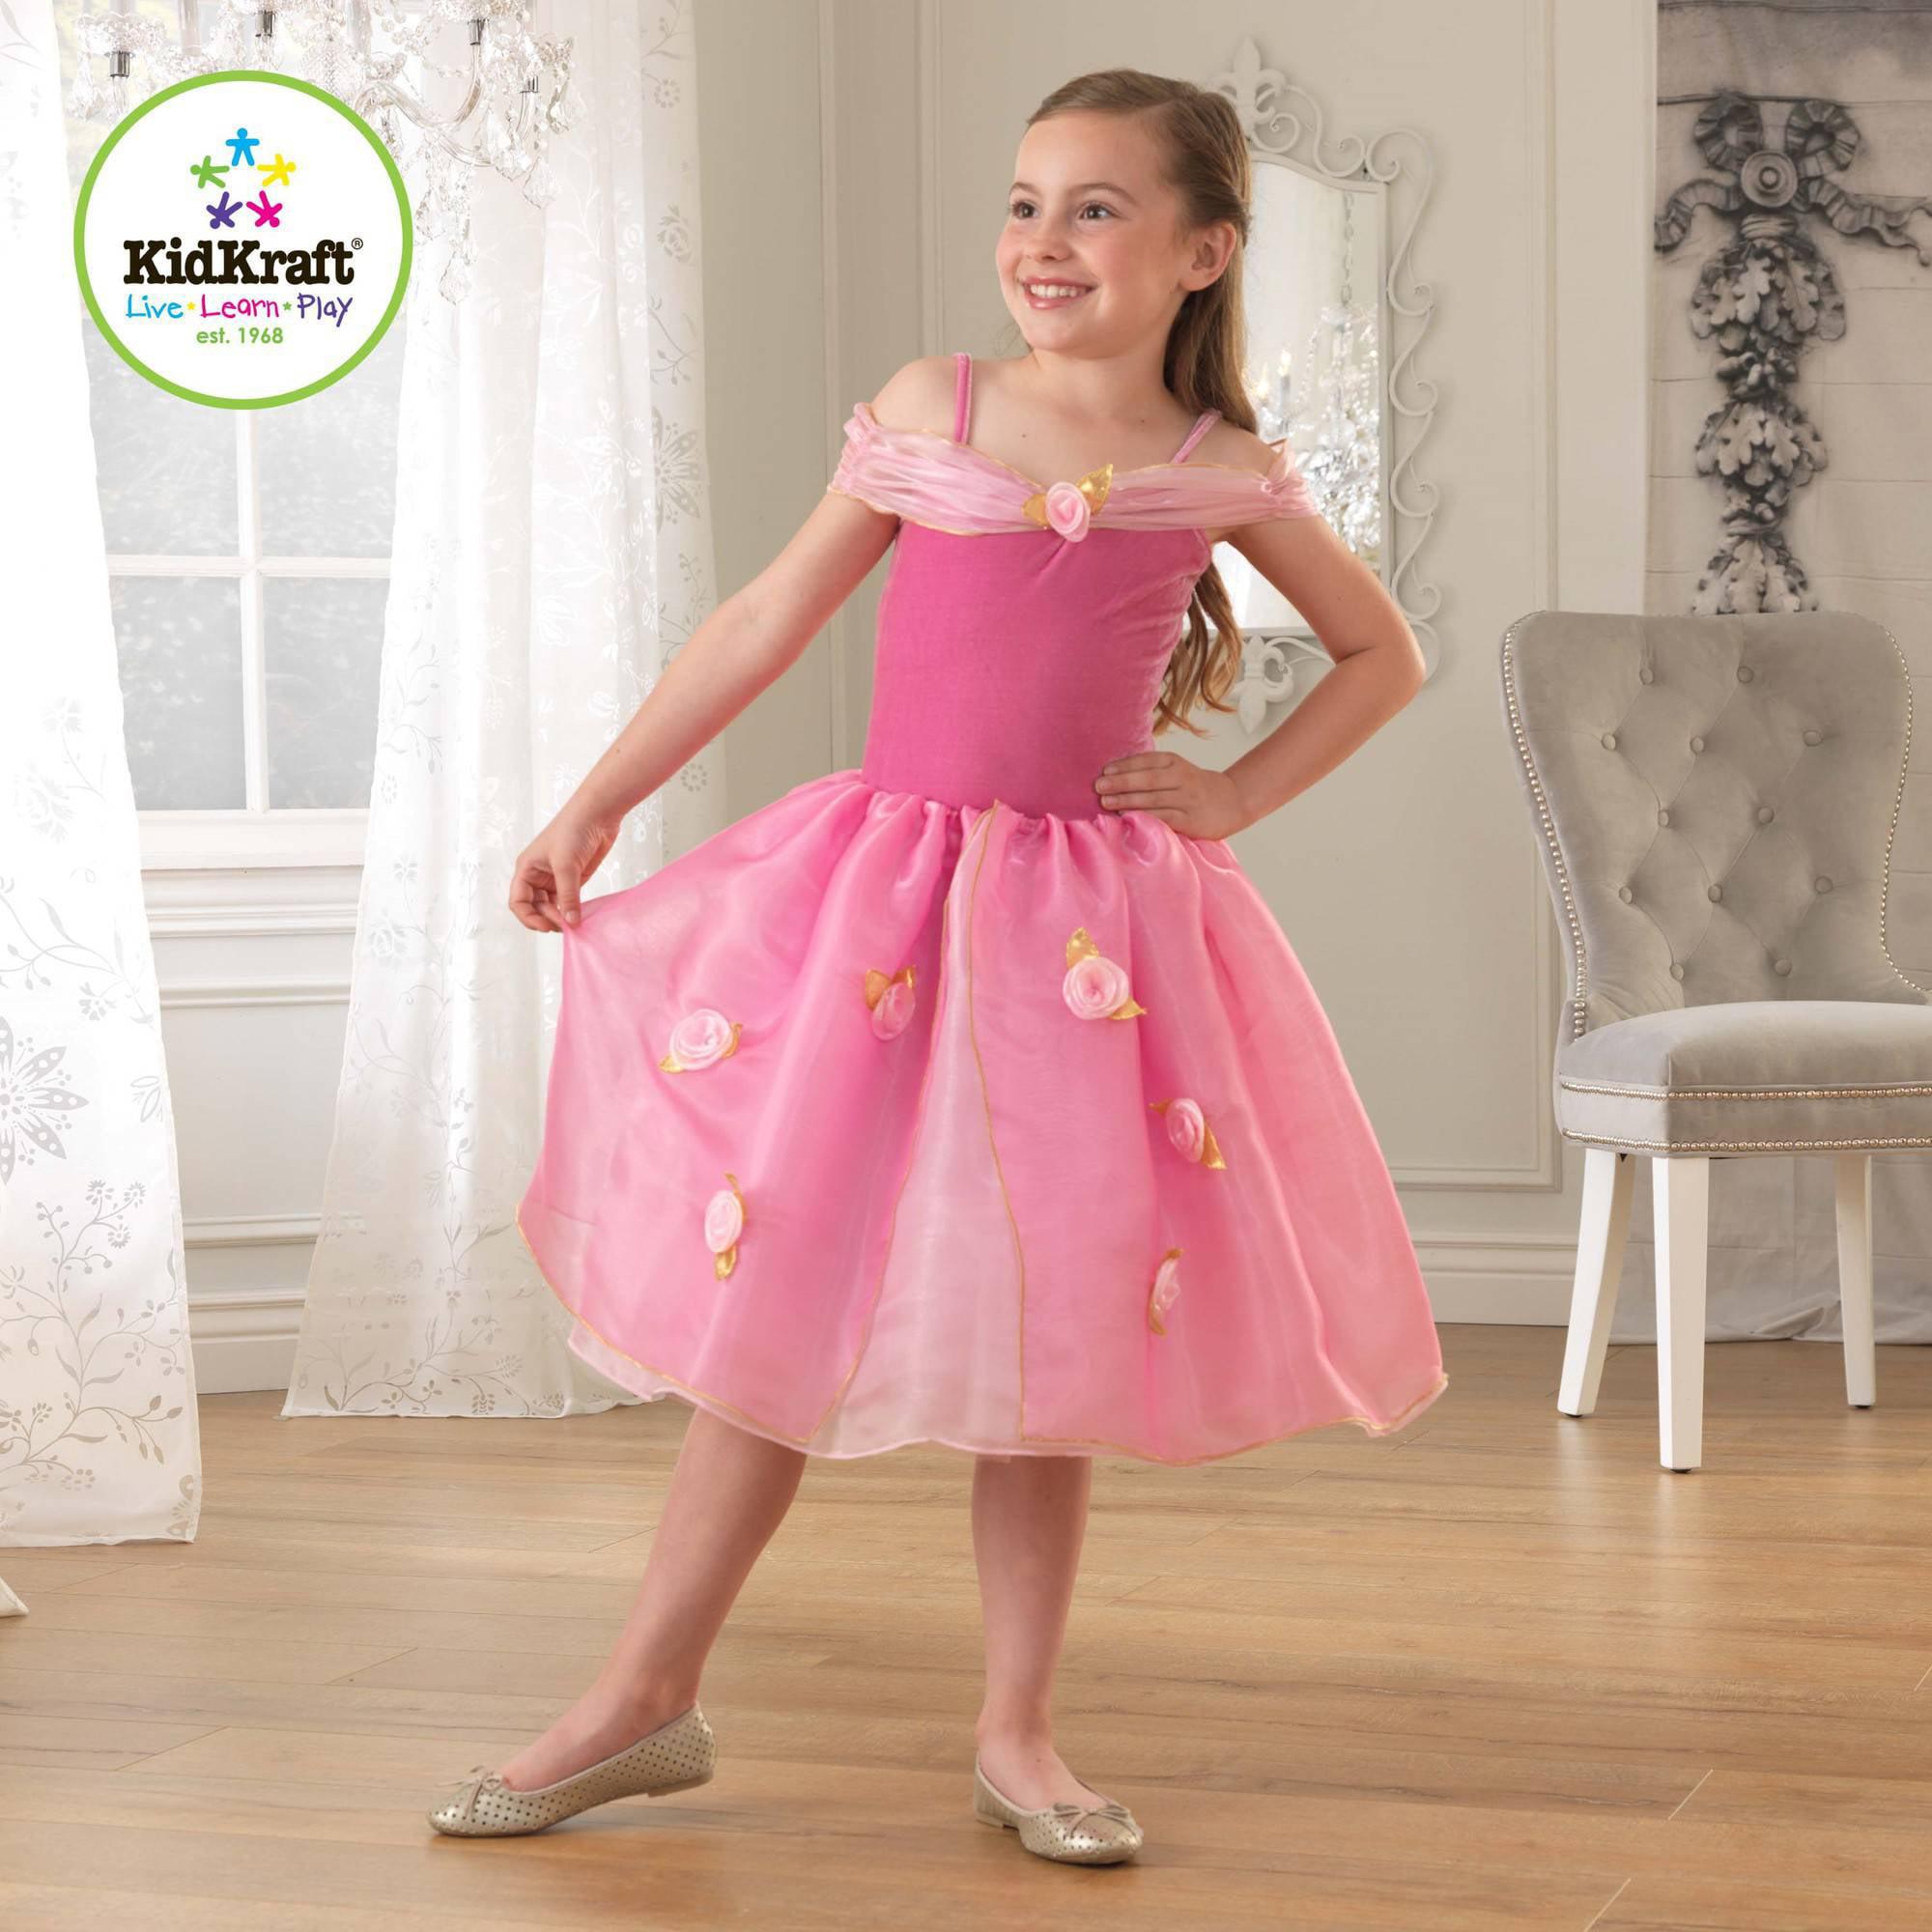 KidKraft Pink Rose Princess Dress Up Costume